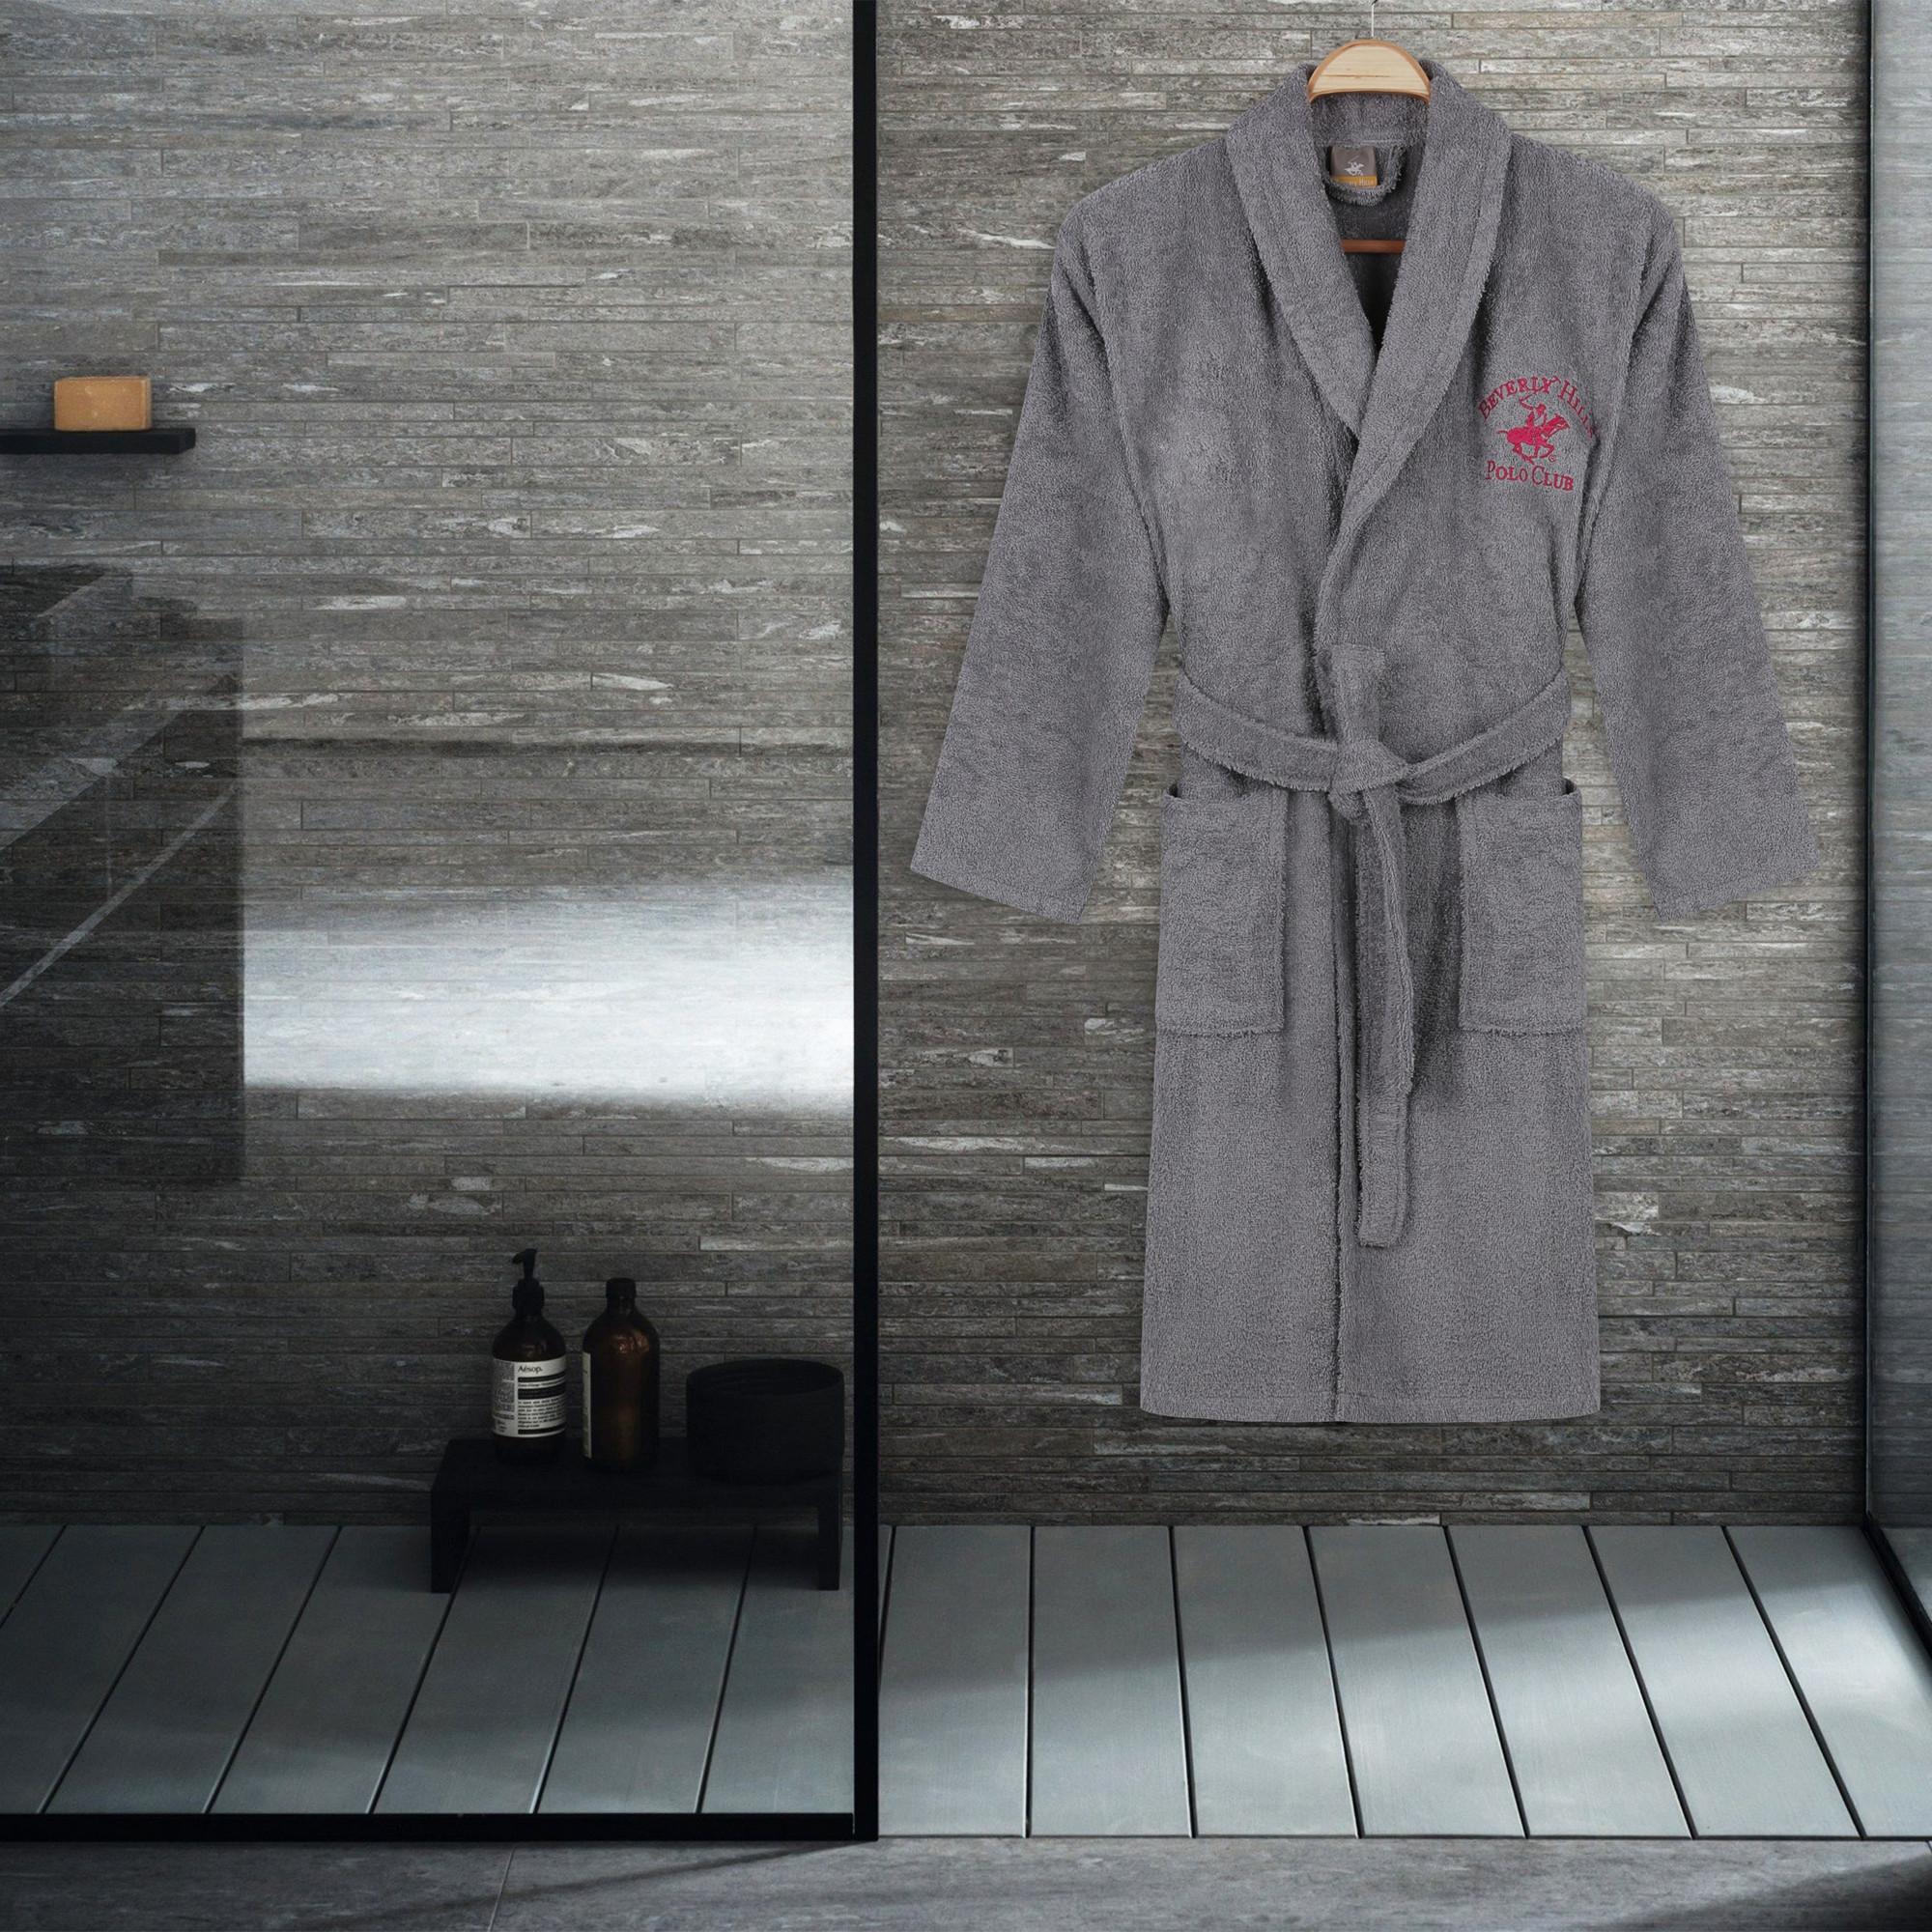 Halat de baie unisex, din bumbac, Beverly Hills Polo Club 700 Gri, M / L imagine